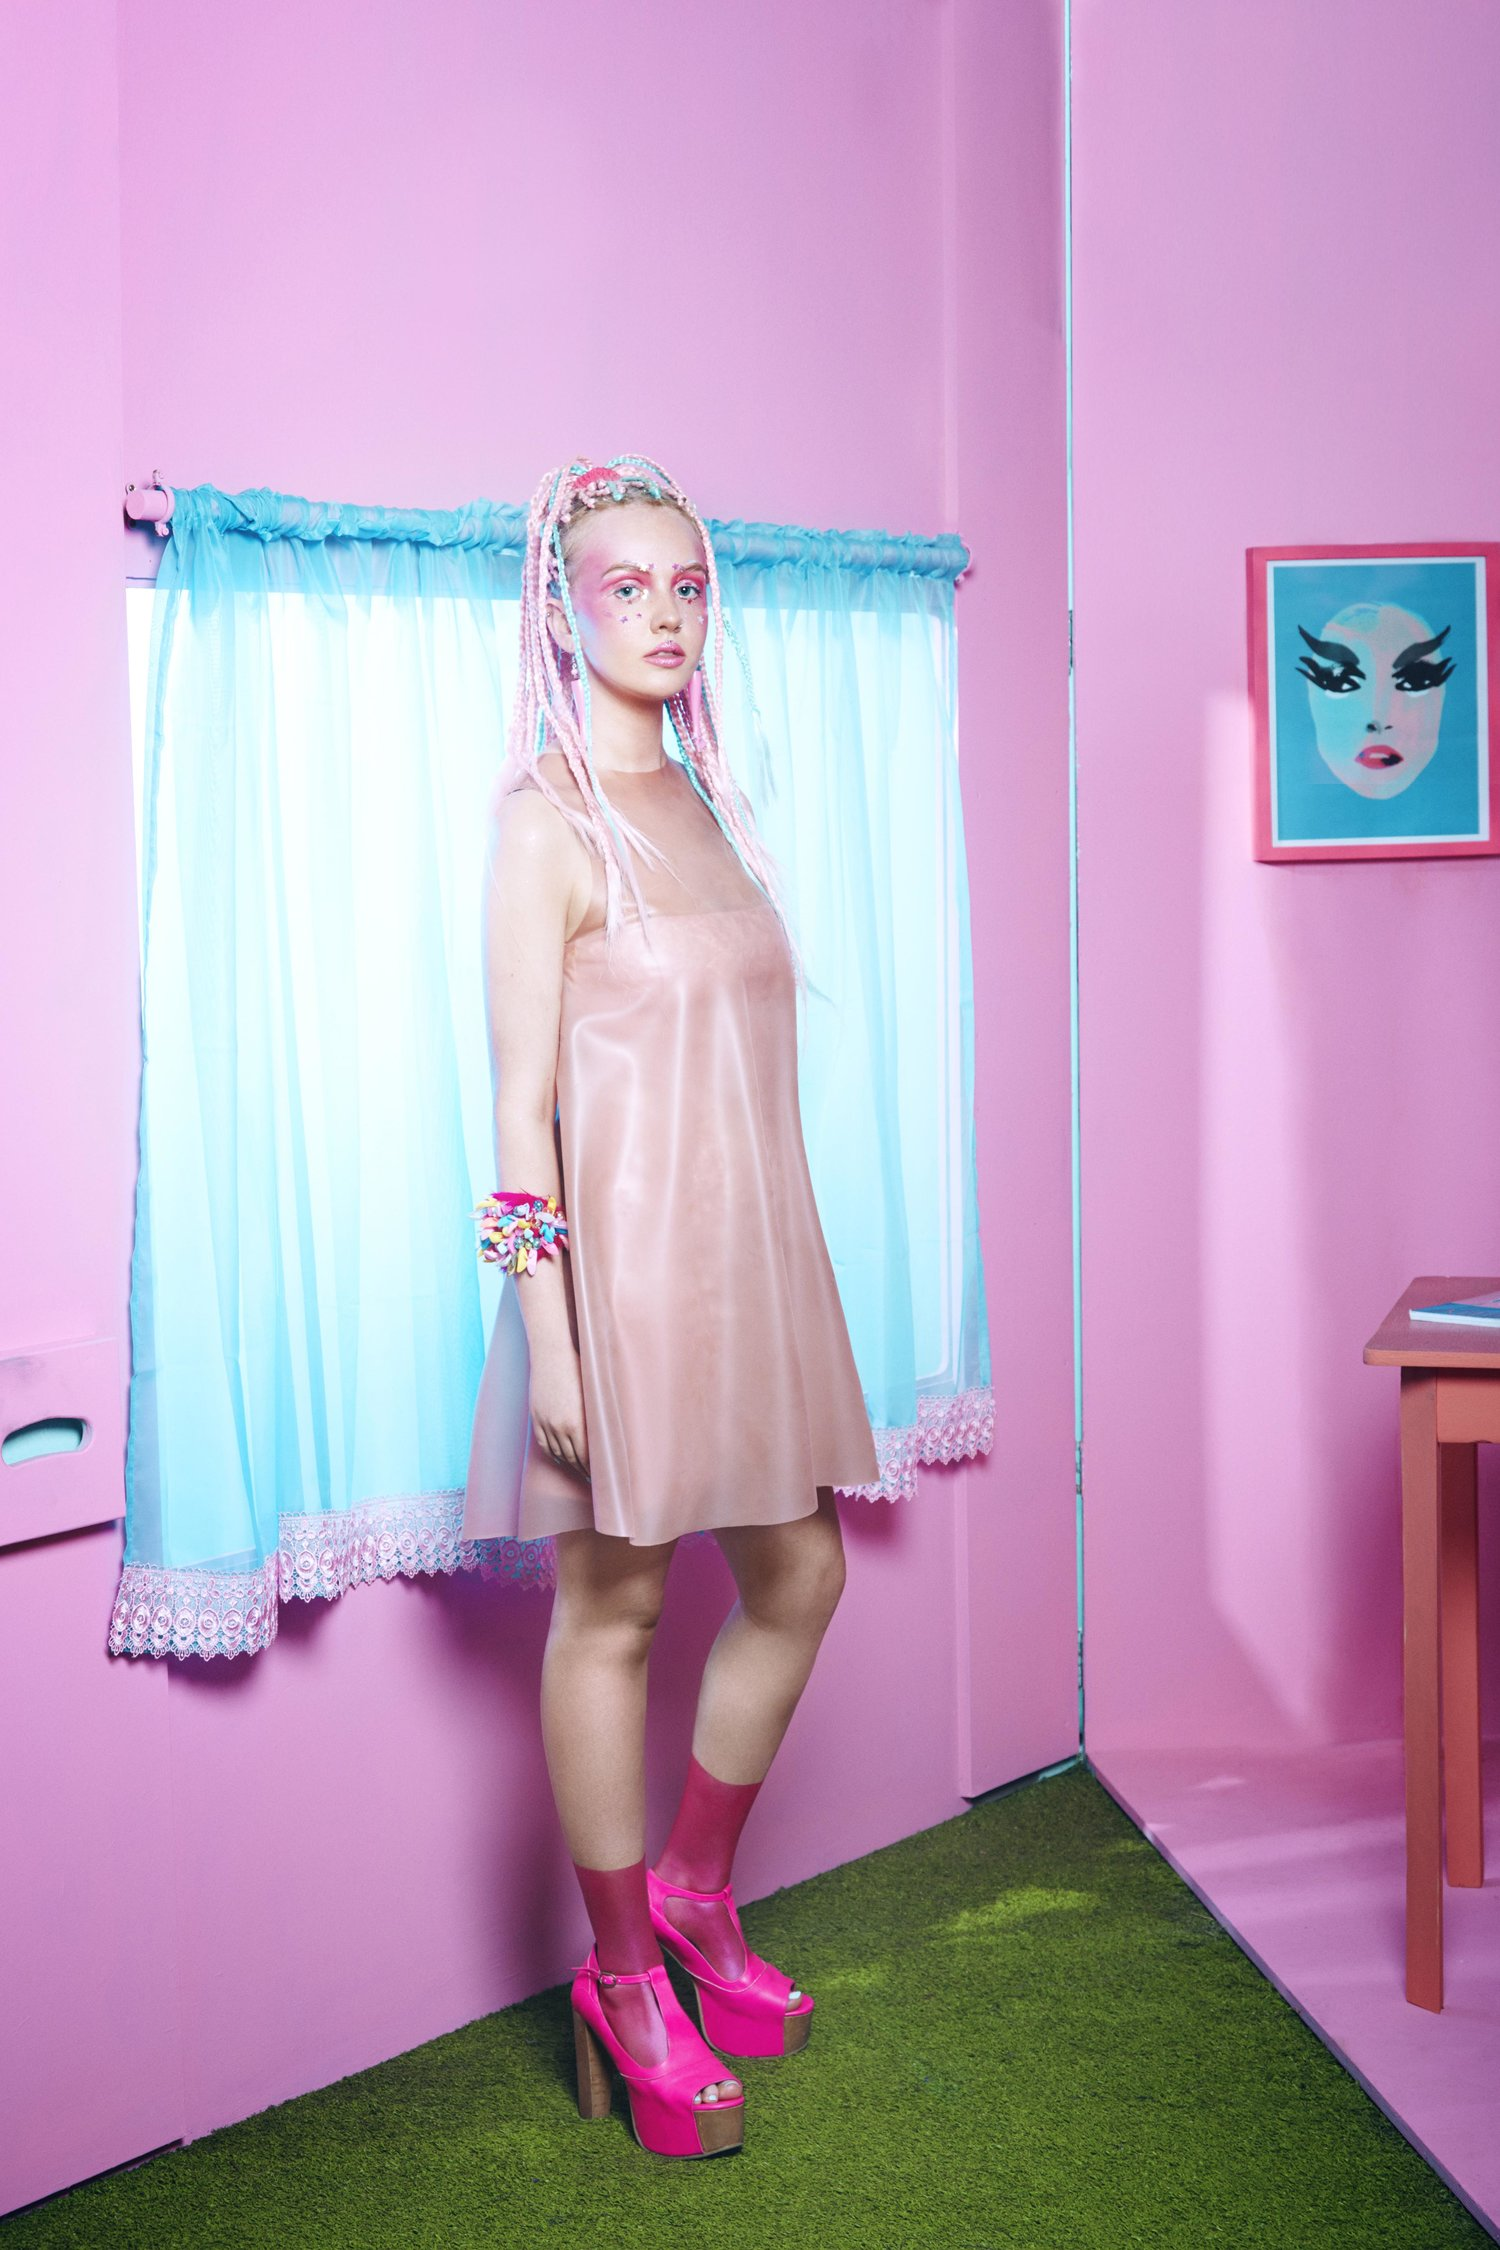 Fabricado для RektMag / фотограф Yannick Lalardy Модель Kirsty Sorley